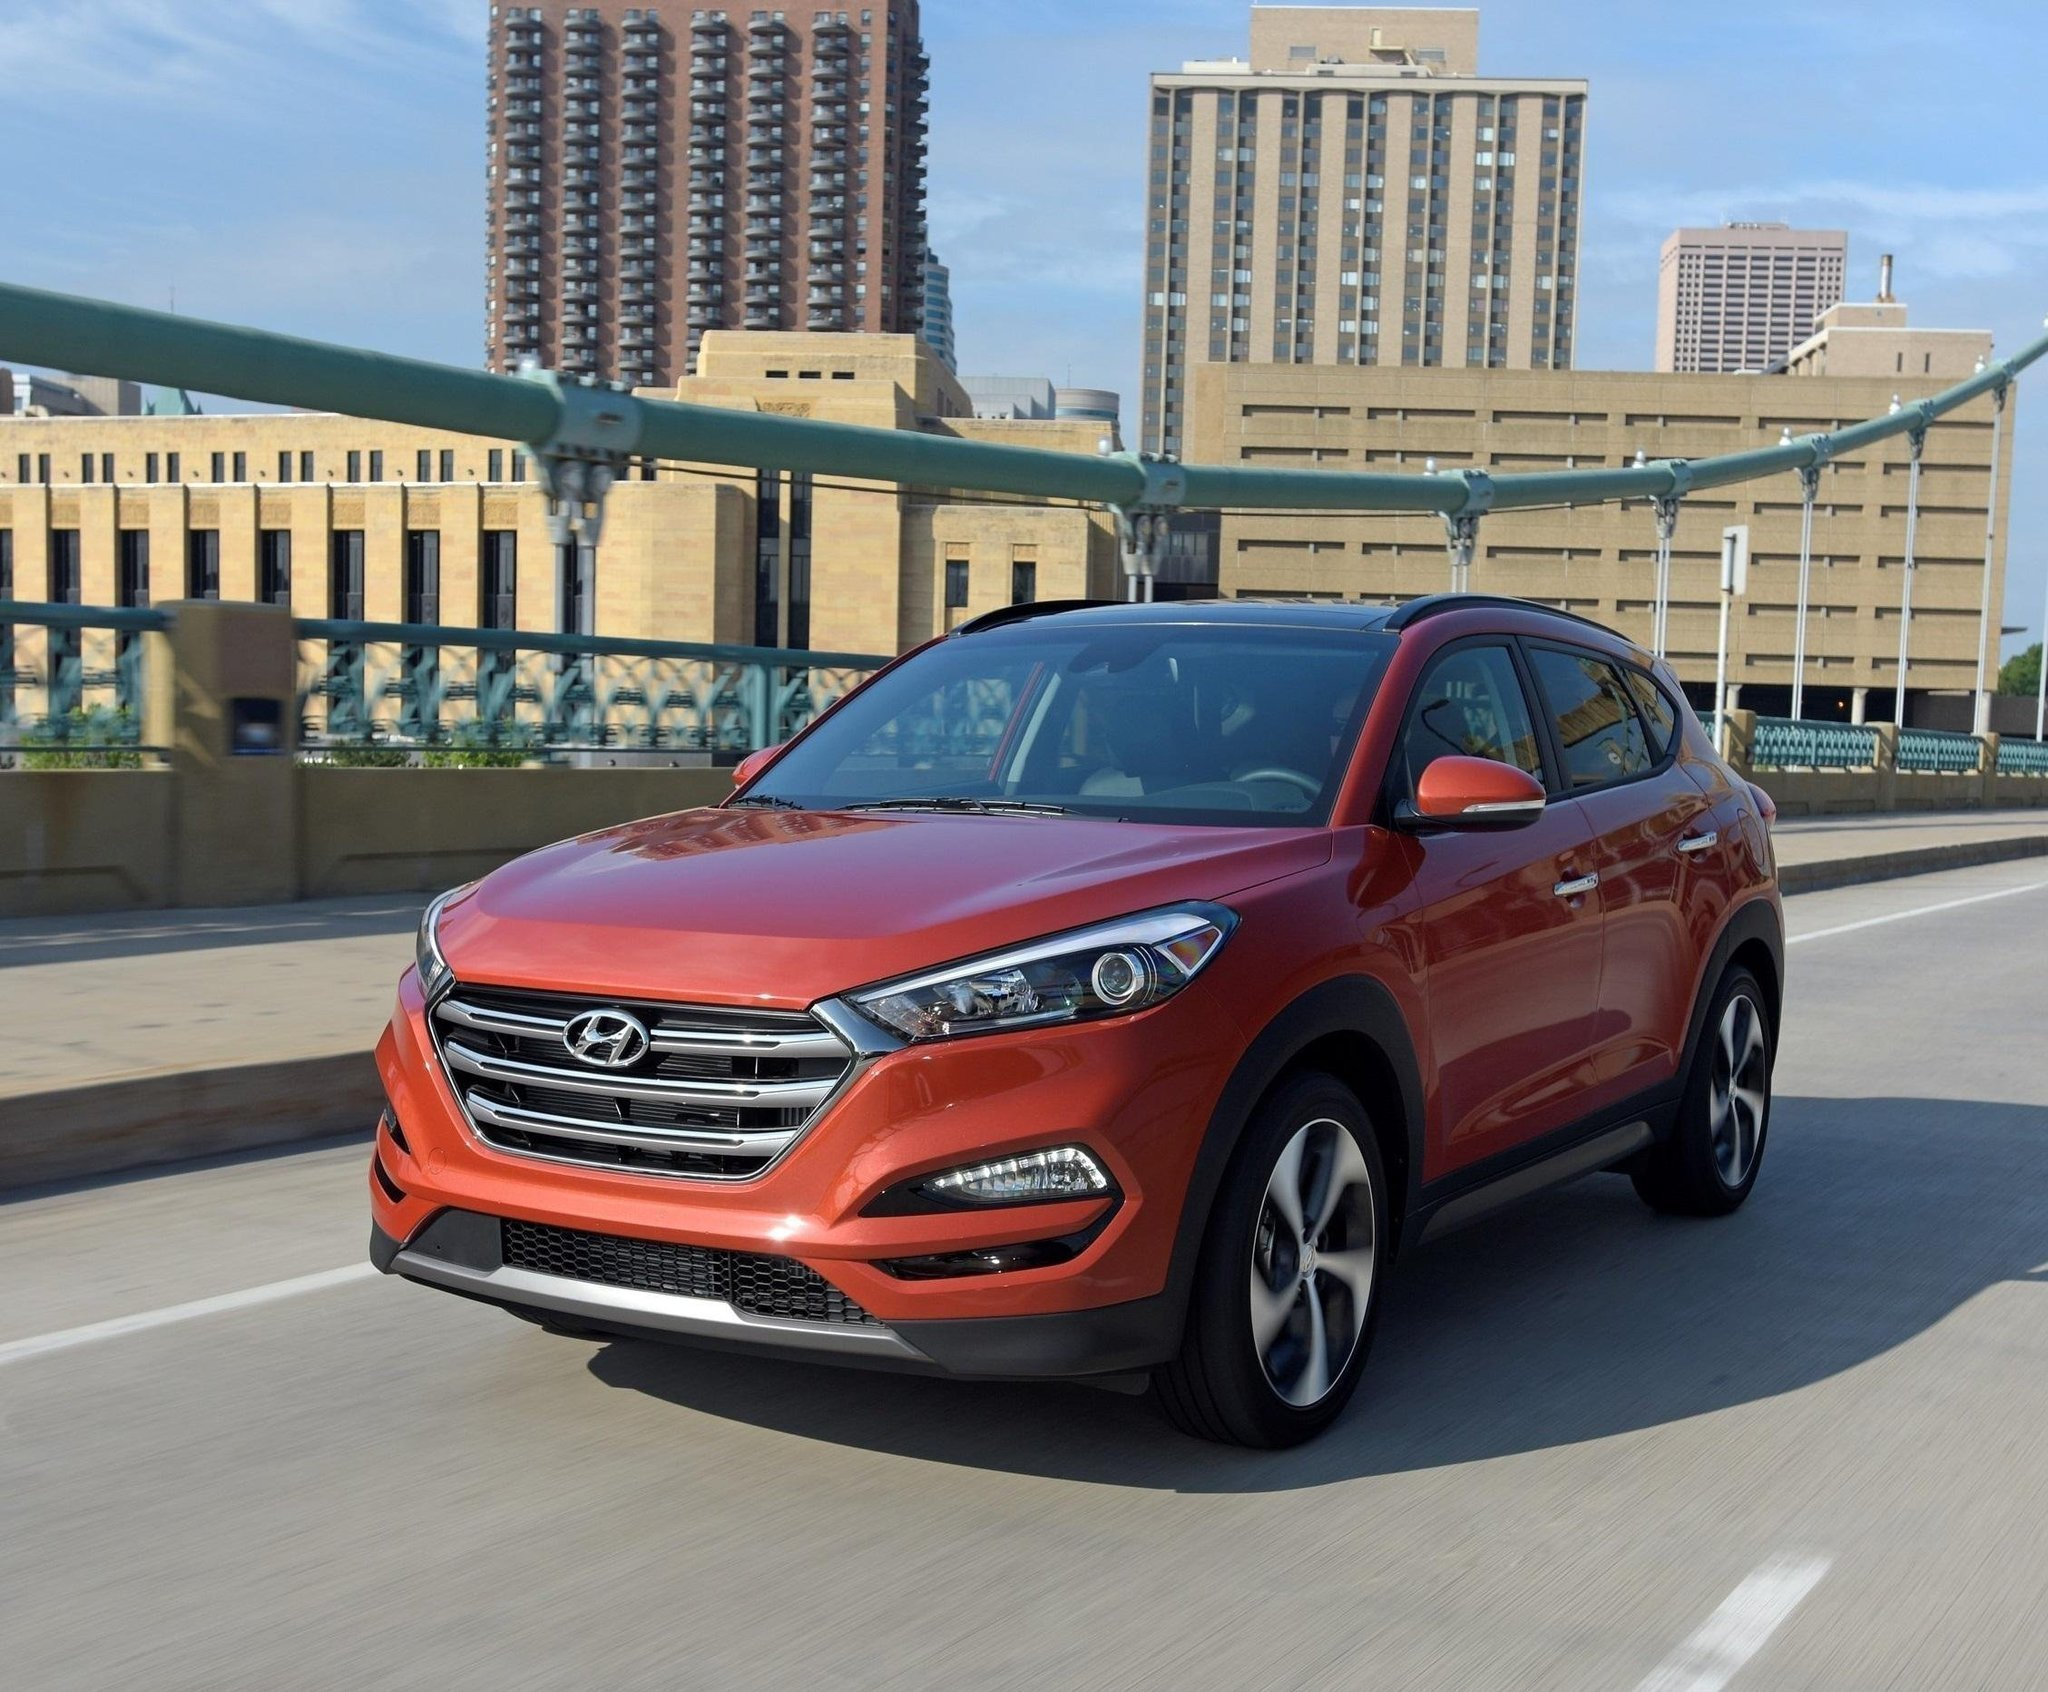 The Redesigned 2016 Hyundai Tucson Packs Versatility Refinement But